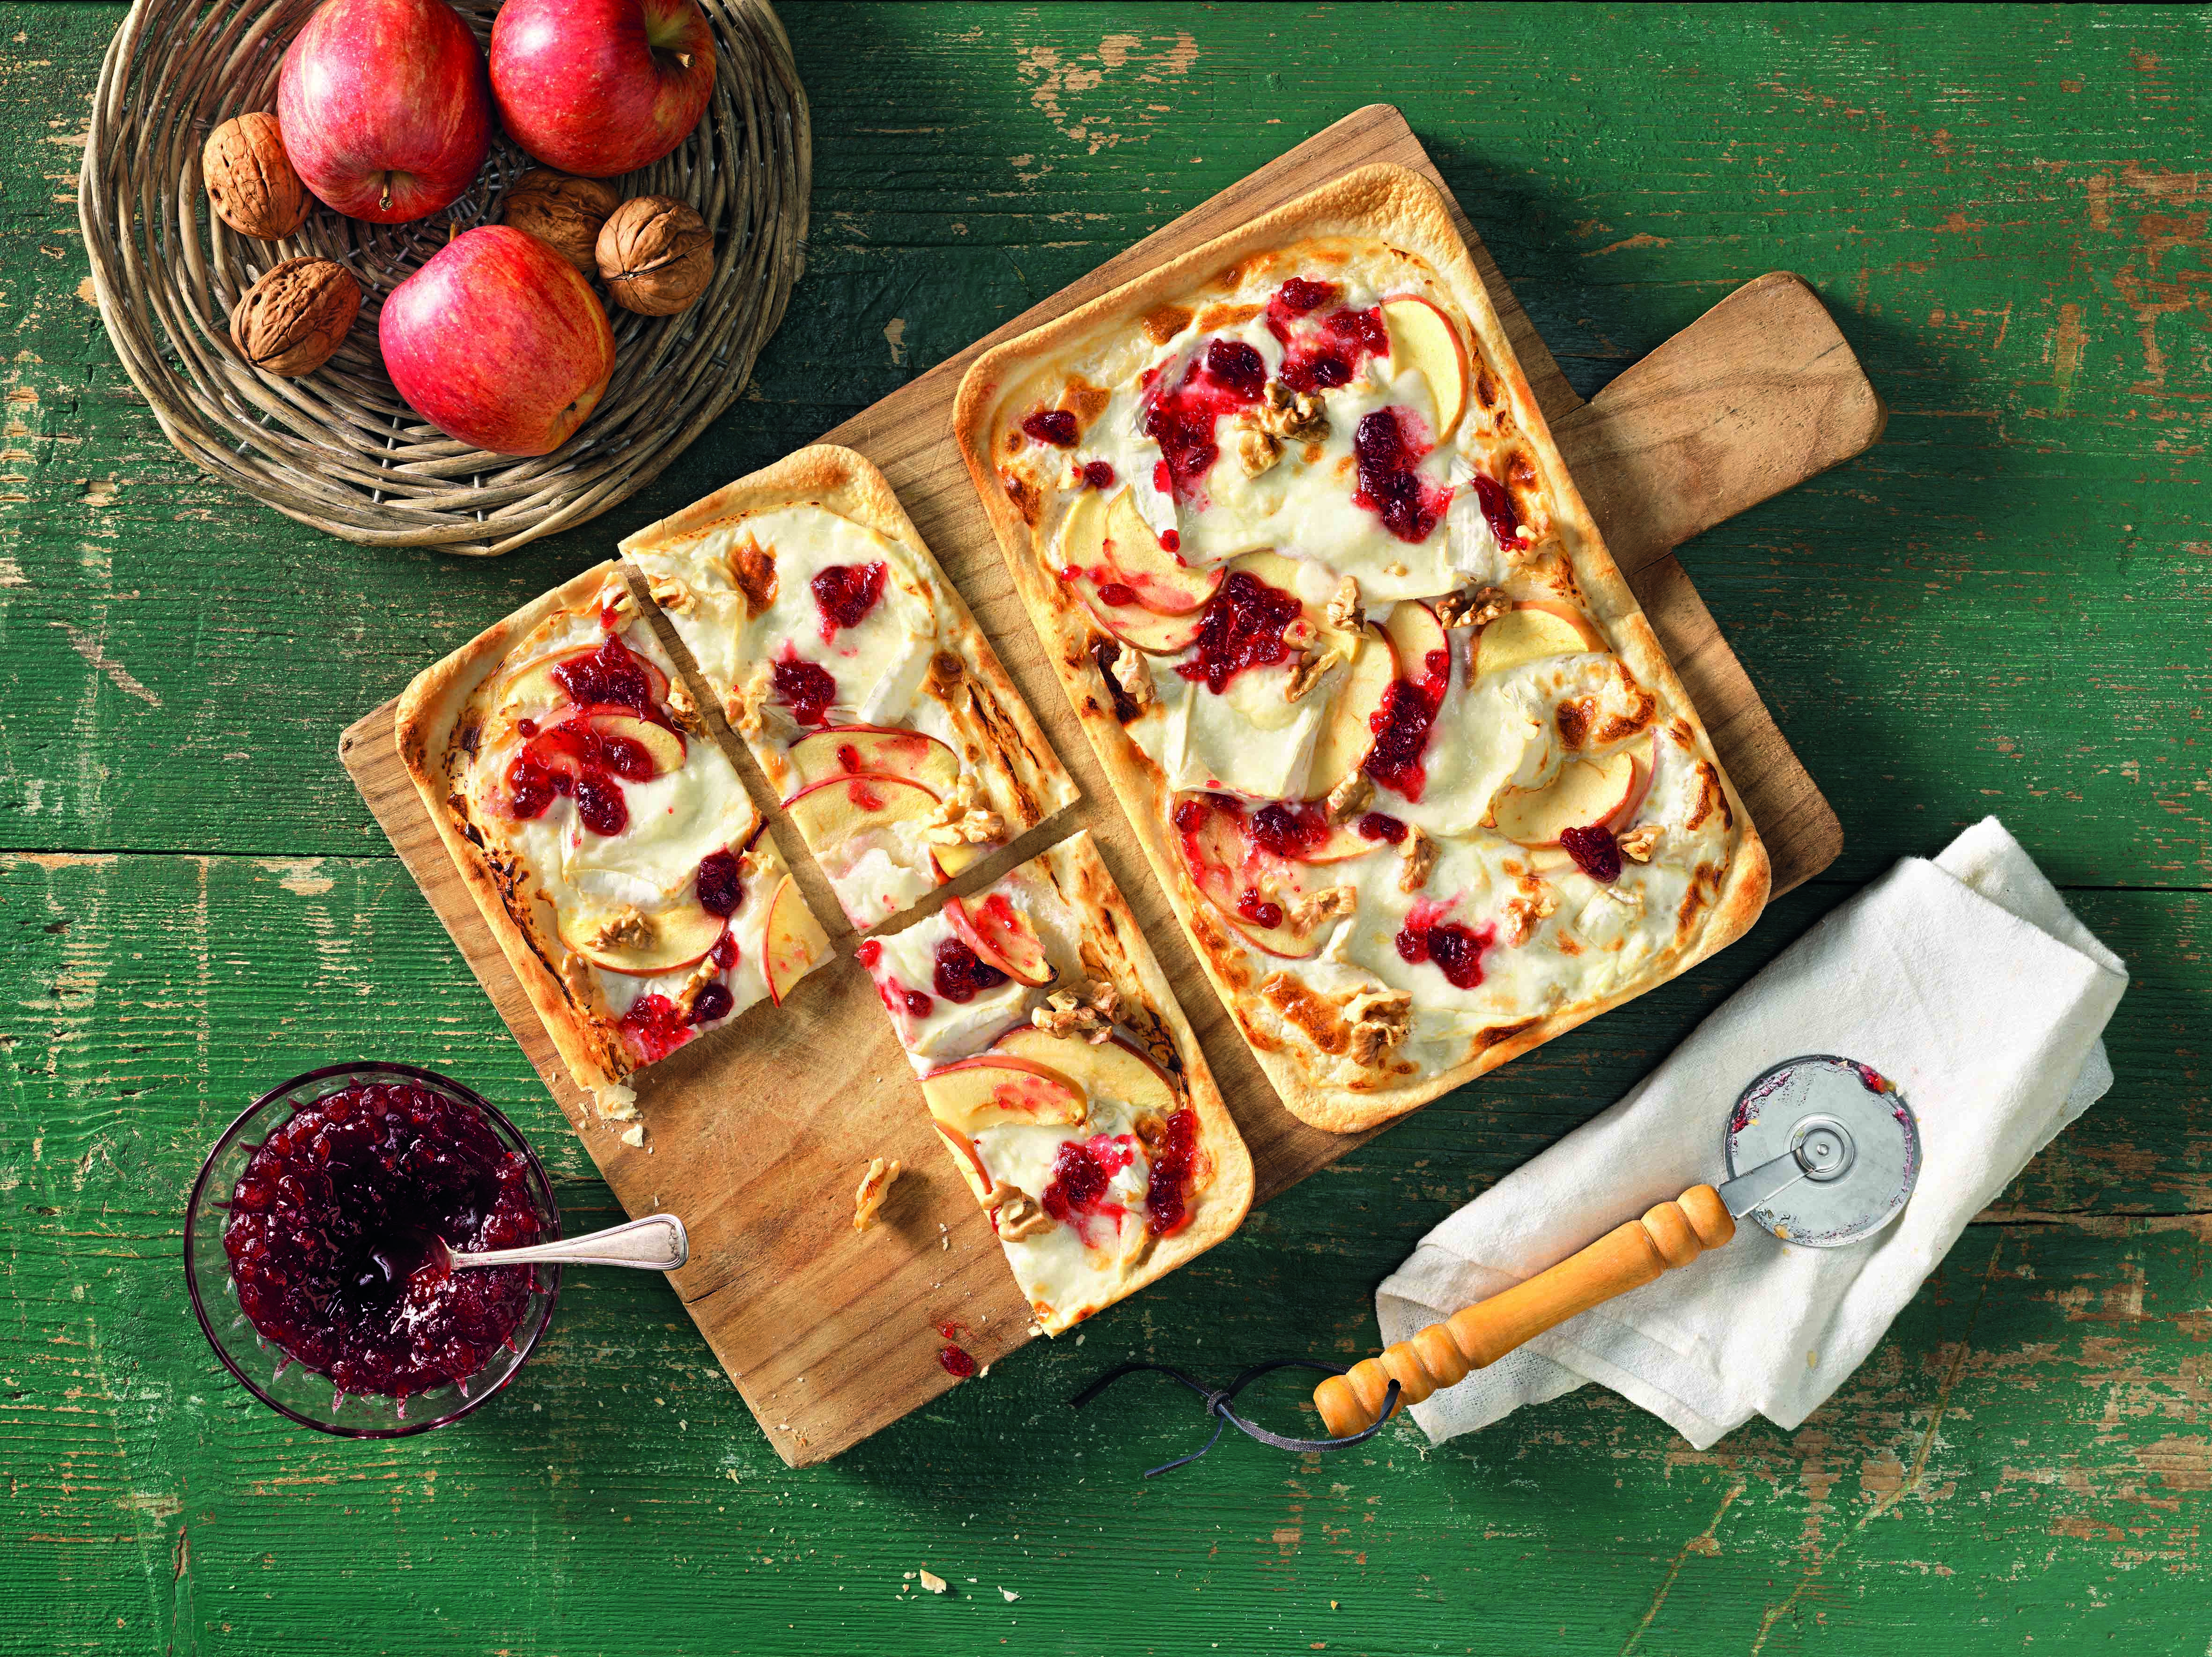 Recept: flammkuchen met geitenkaas camembert en appel - Tante Fanny